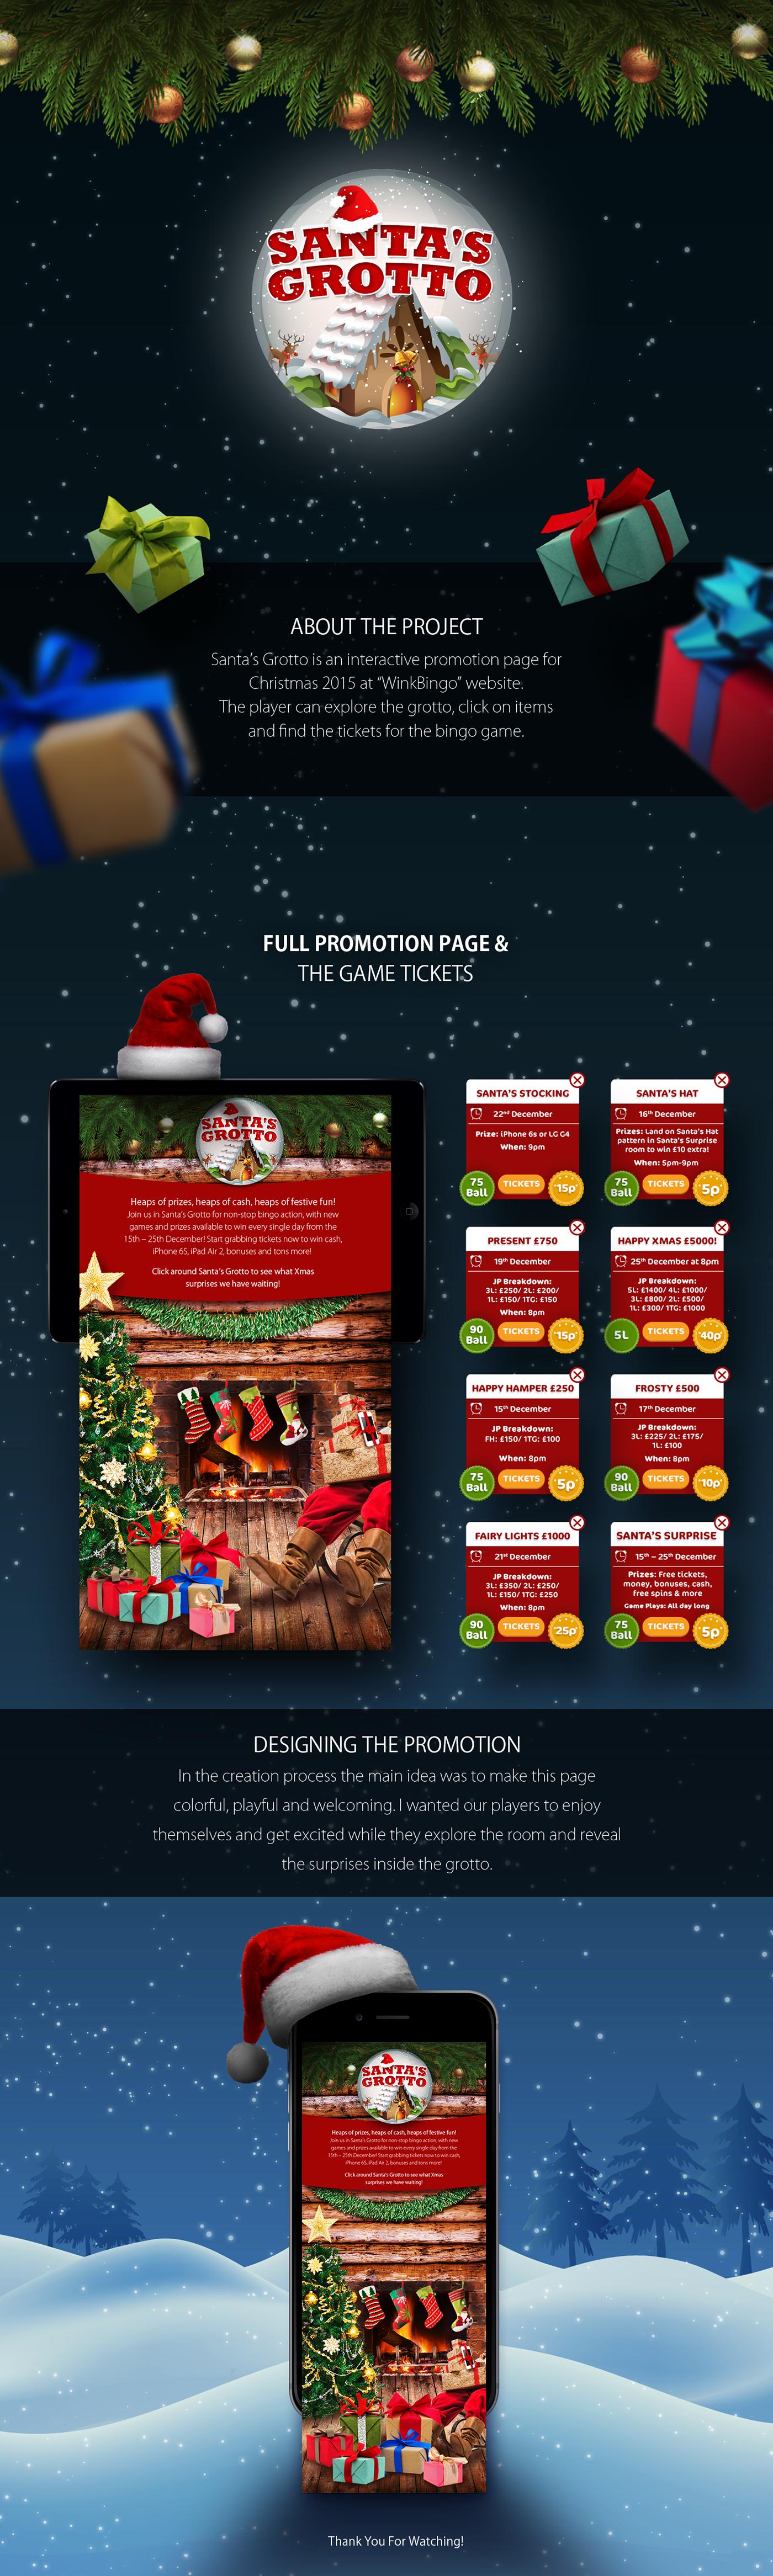 Web Design  interactive design Promotion graphic design  UI Gaming branding  xmas Christmas